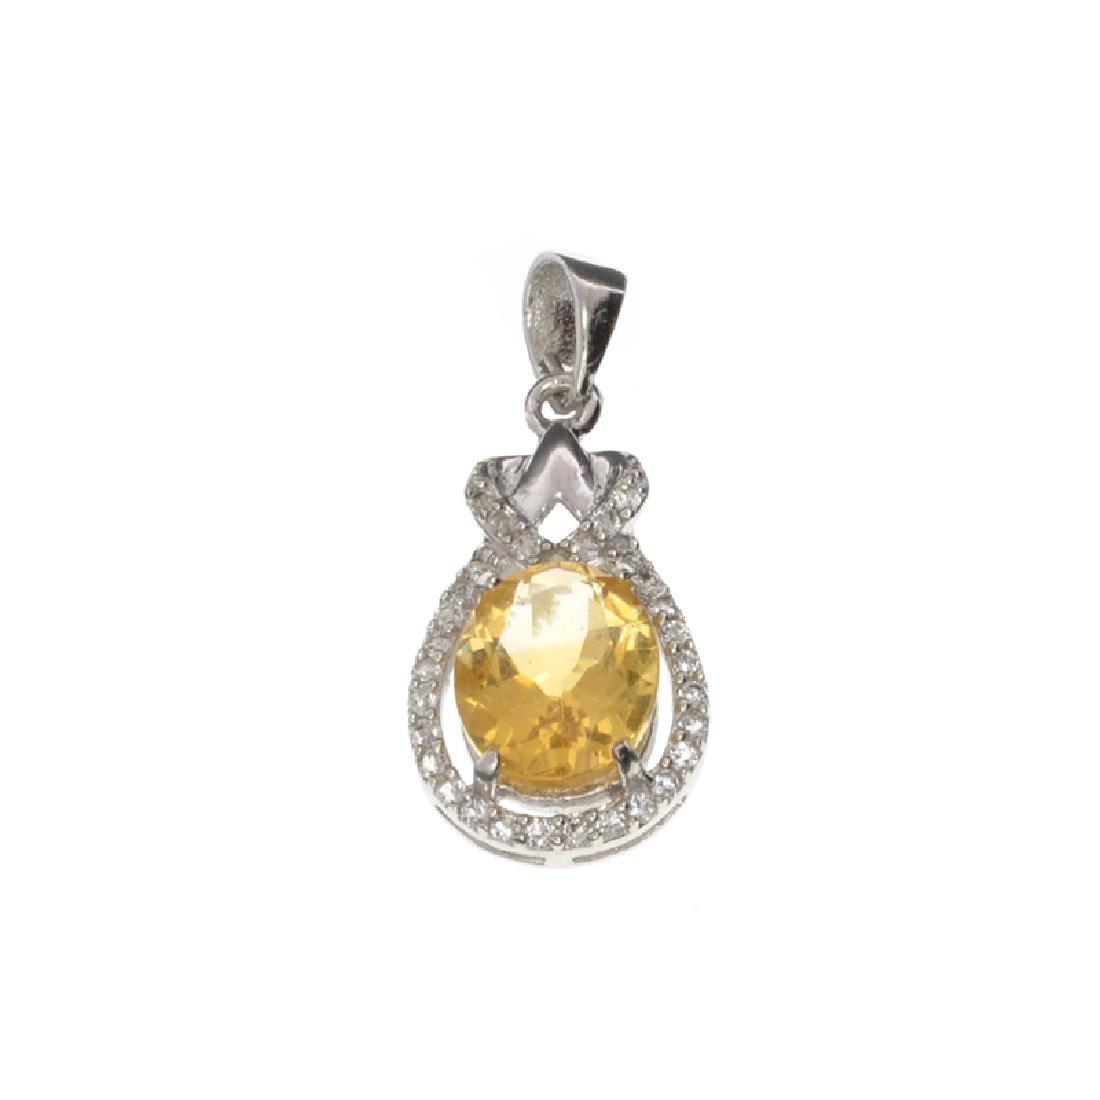 APP: 0.6k Fine Jewelry 2.50CT Citrine And White